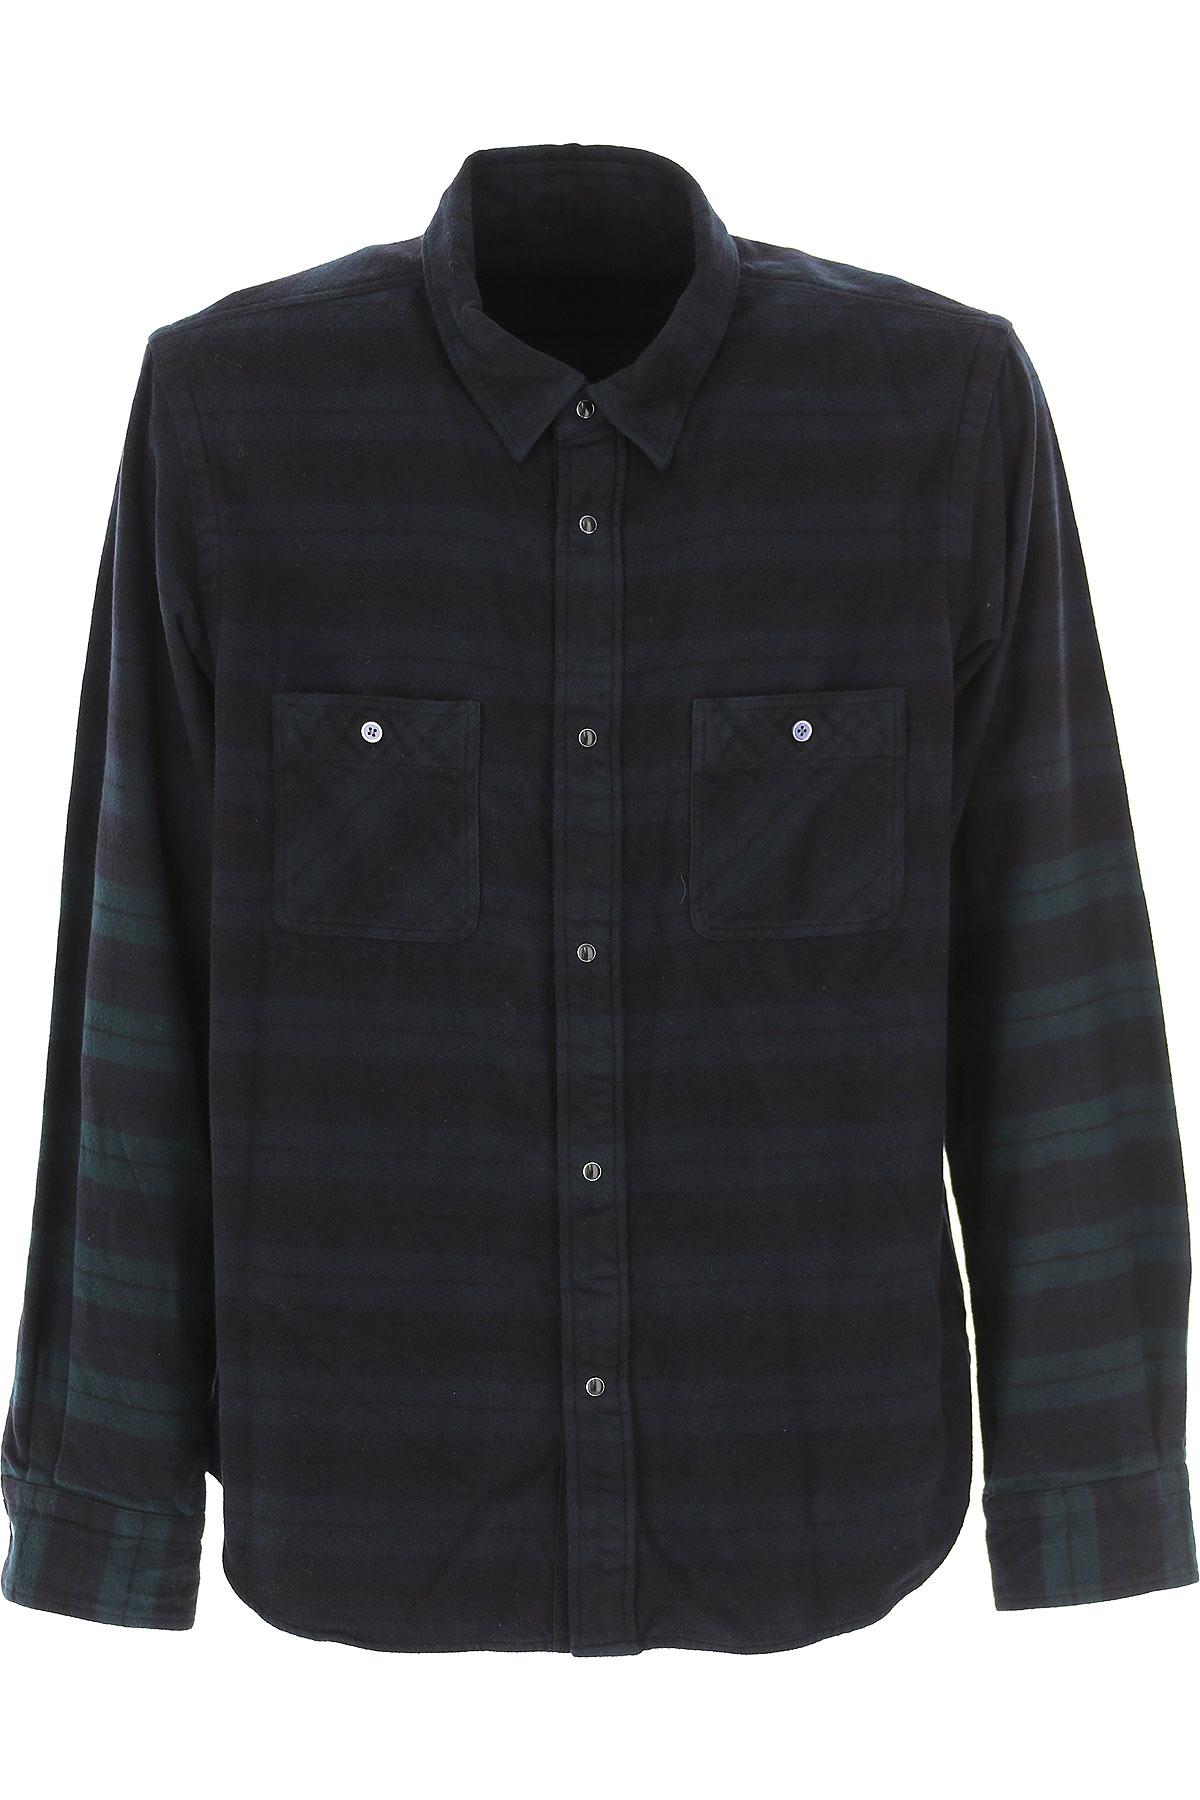 Image of Sacai Shirt for Men, Dark Midnight Blue, Cotton, 2017, L M S XL